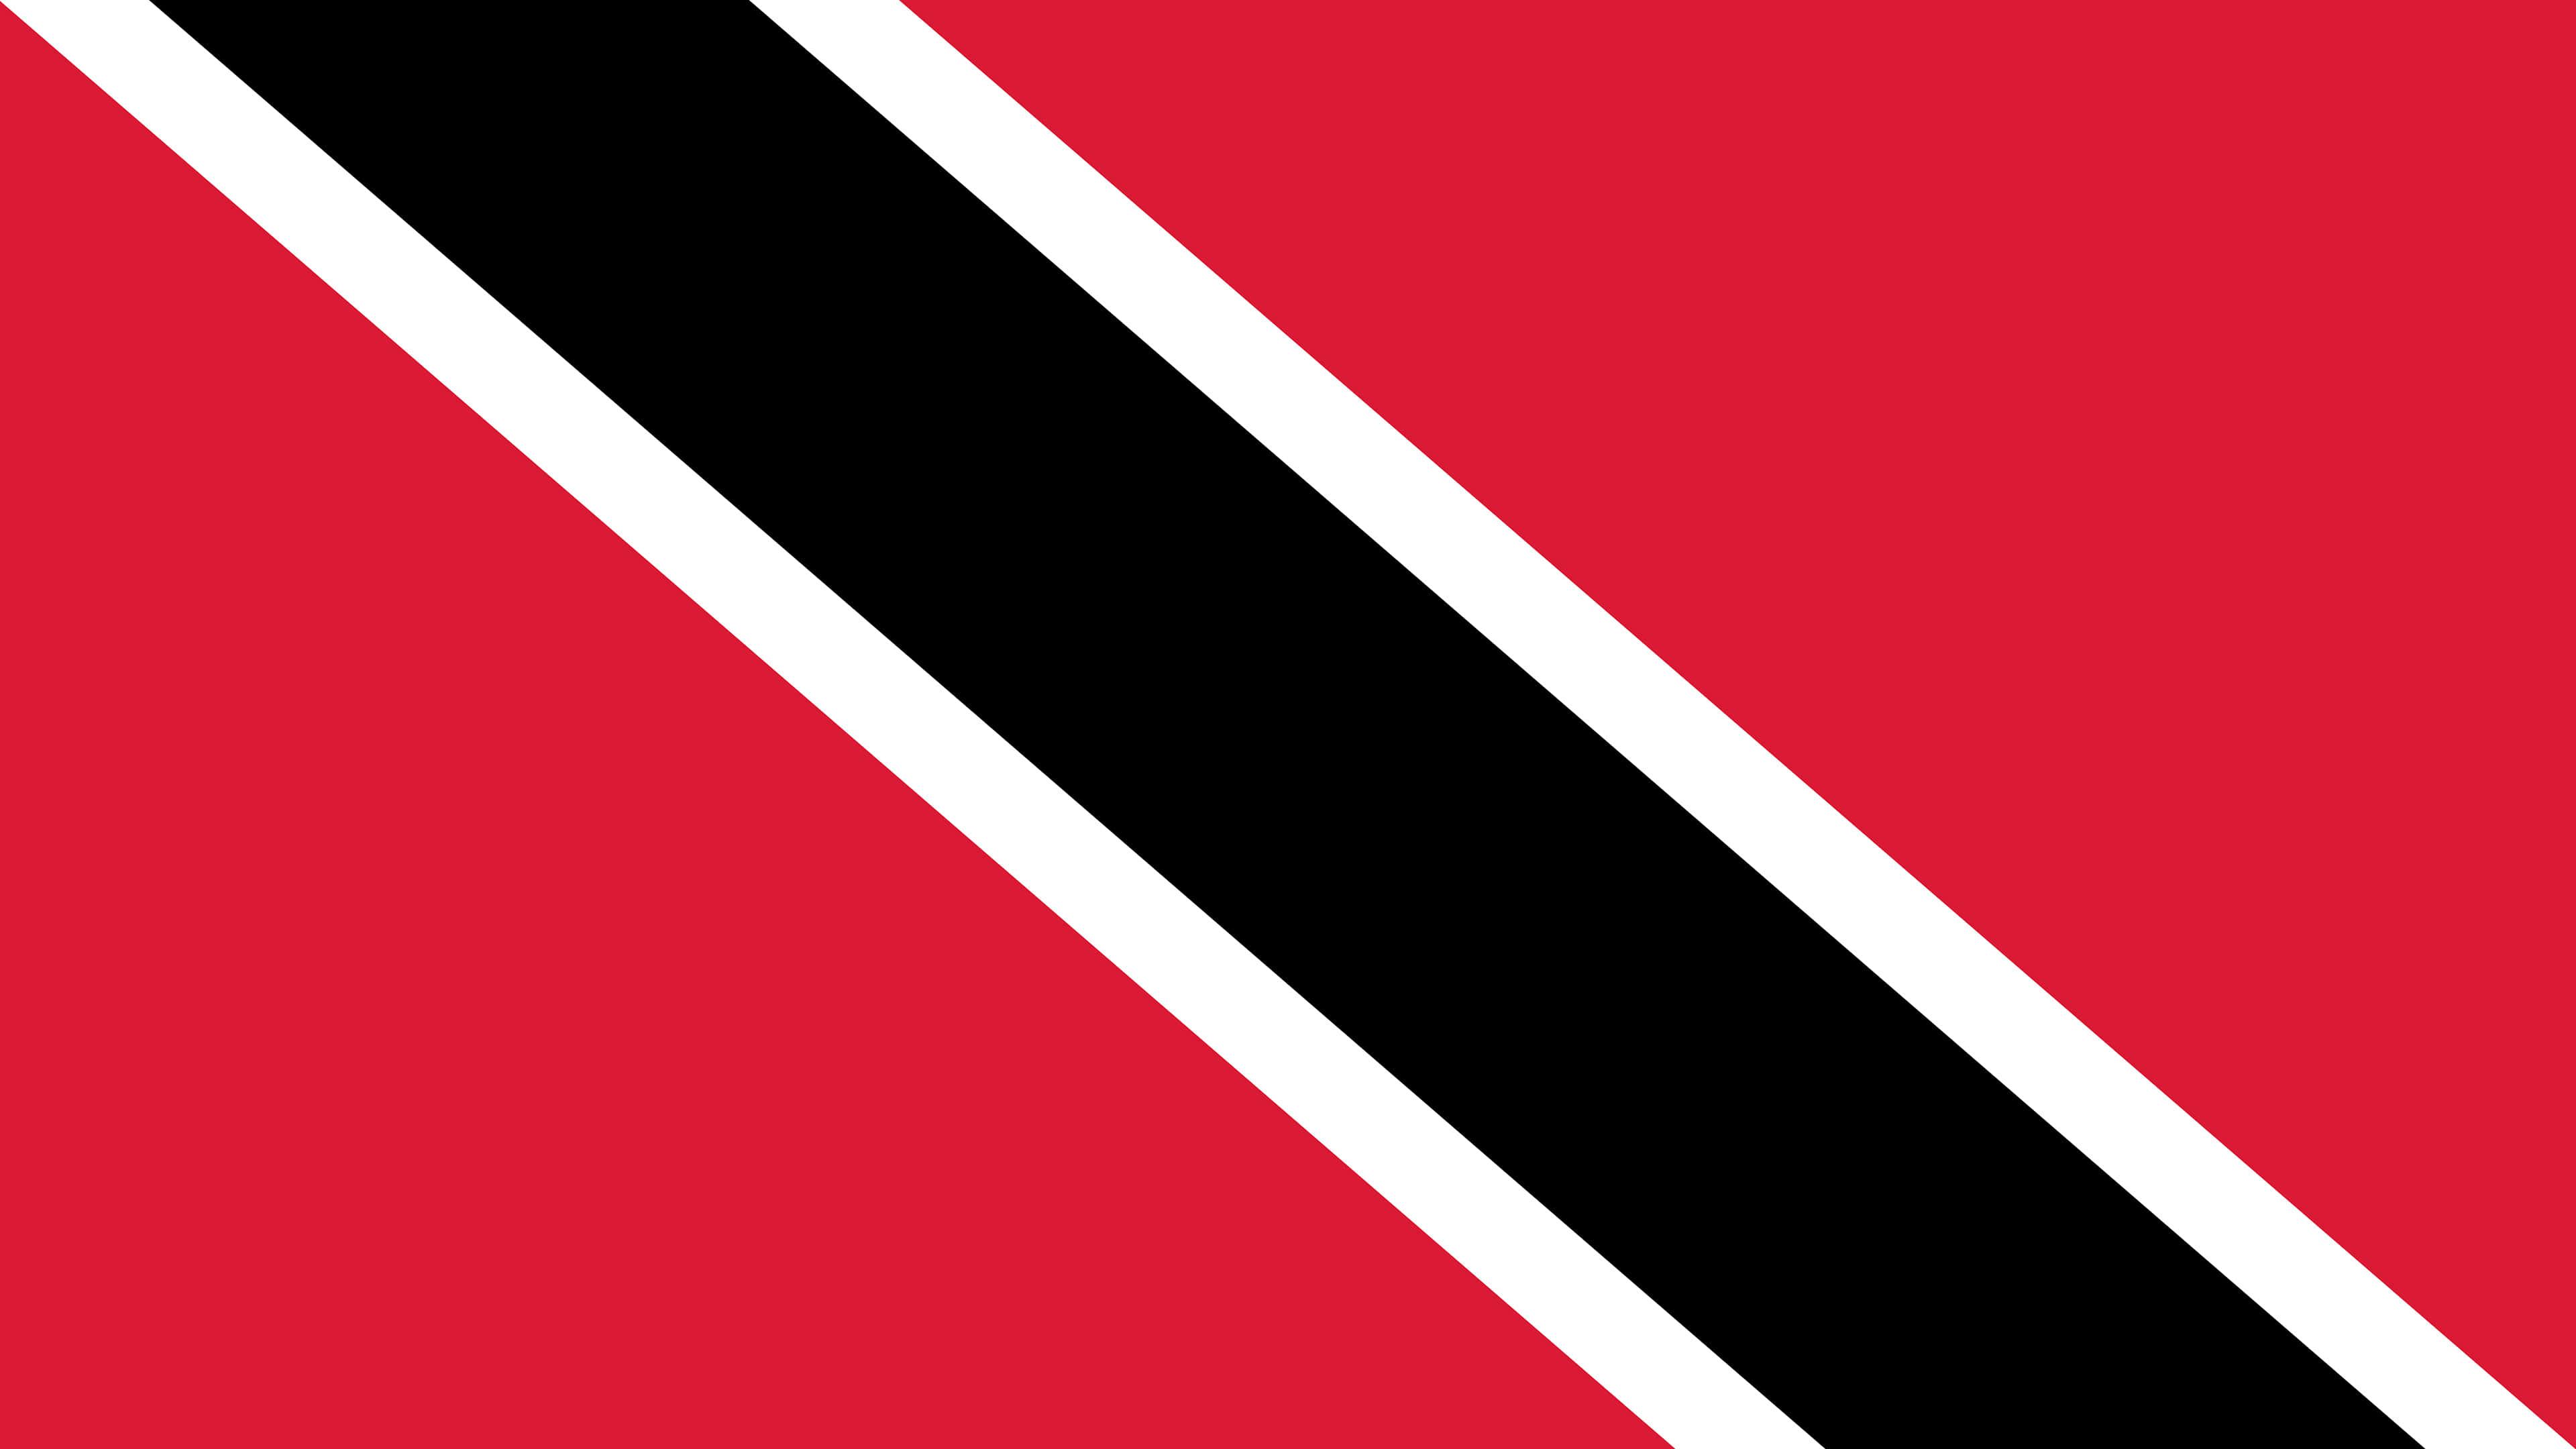 Trinidad And Tobago Flag UHD 4K Wallpaper Pixelz 3840x2160